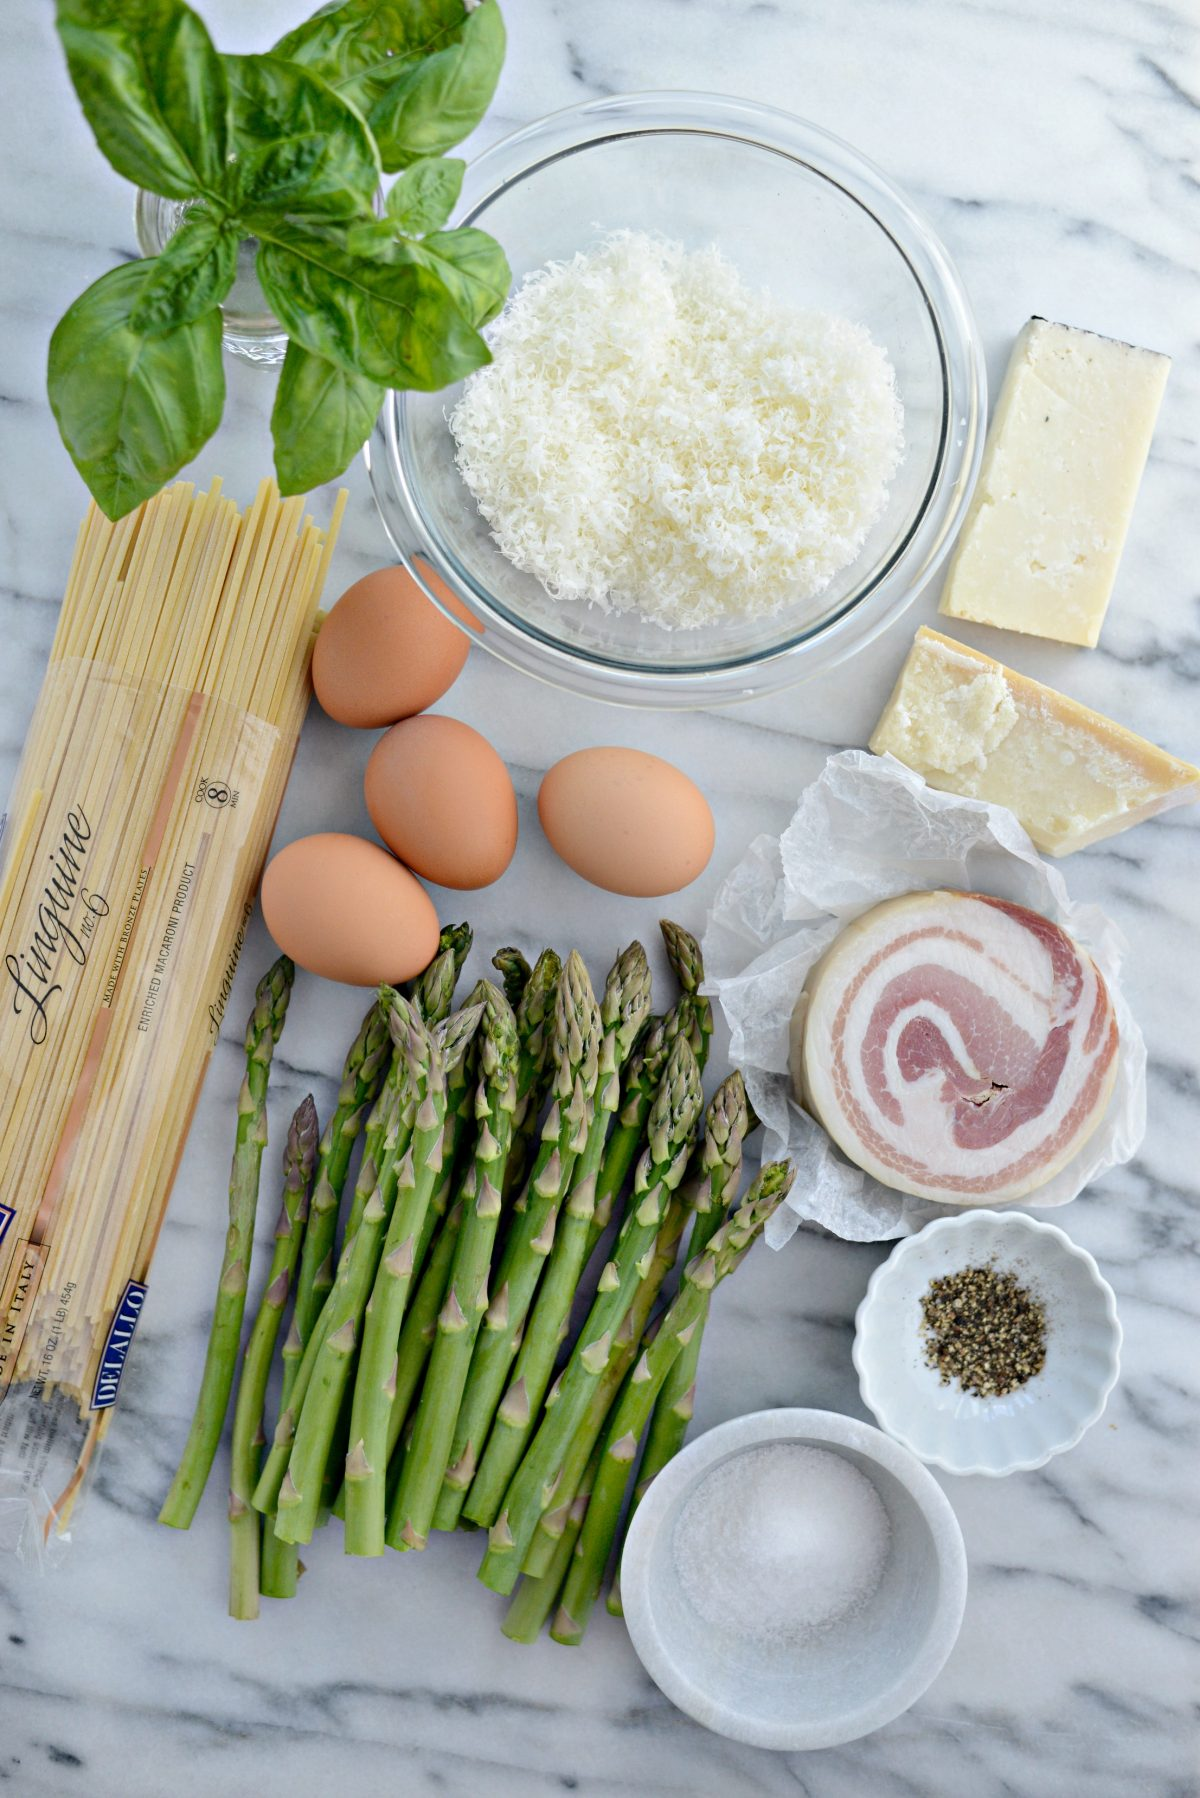 Pancetta Asparagus Carbonara l SimplyScratch.com (1)